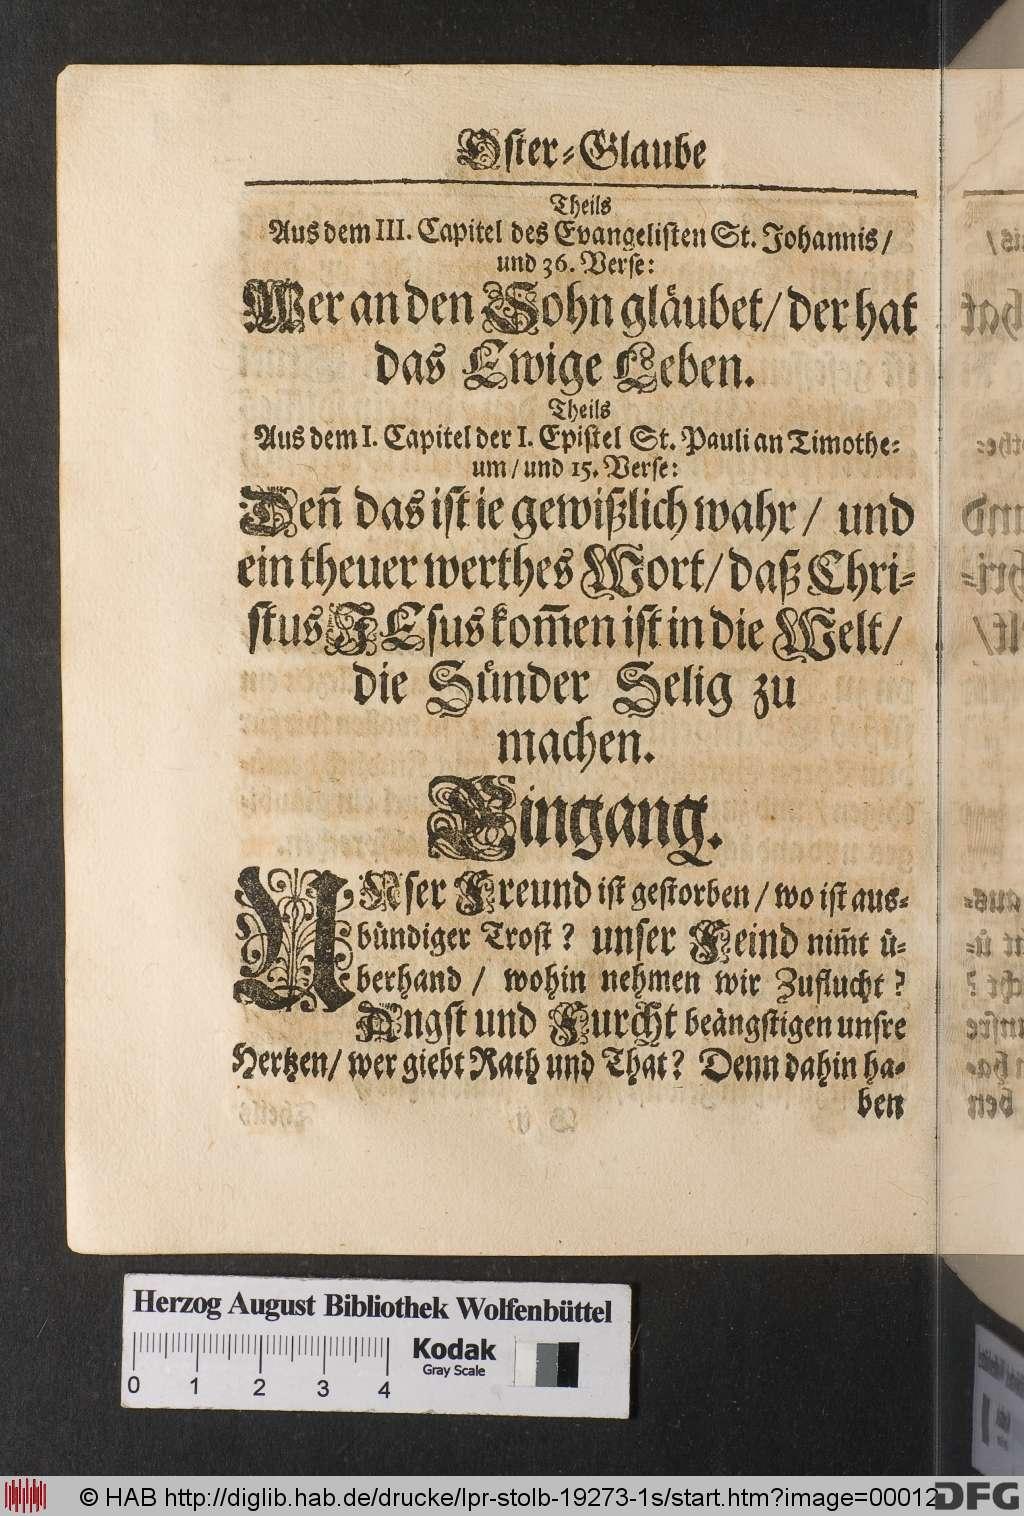 http://diglib.hab.de/drucke/lpr-stolb-19273-1s/00012.jpg